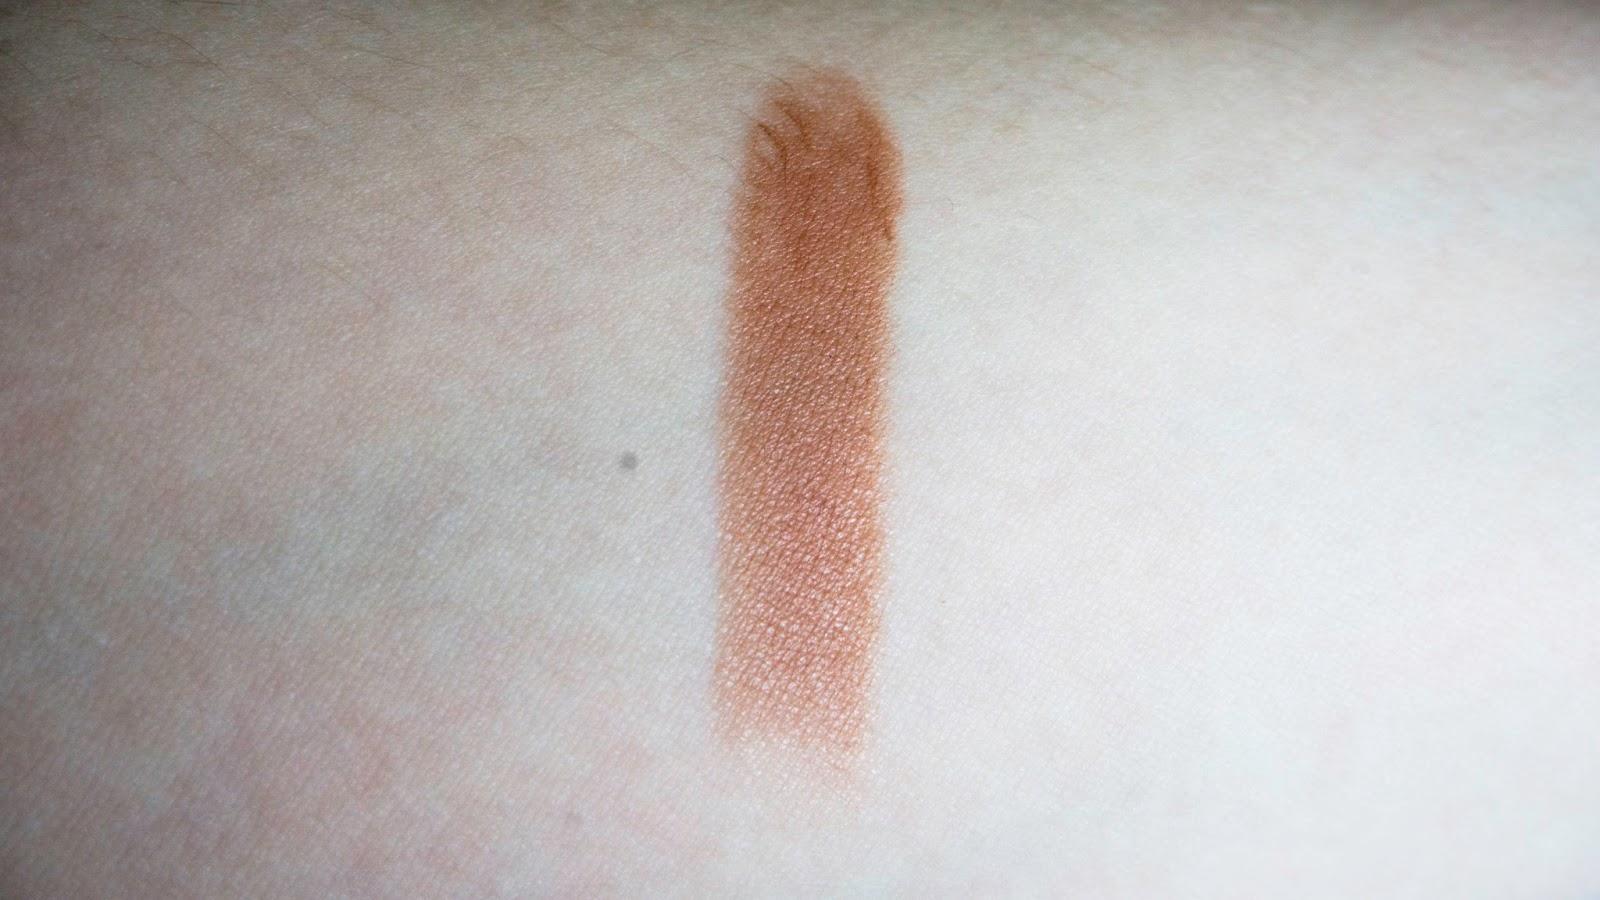 Beautifully Bare Satin Lipstick by e.l.f. #11